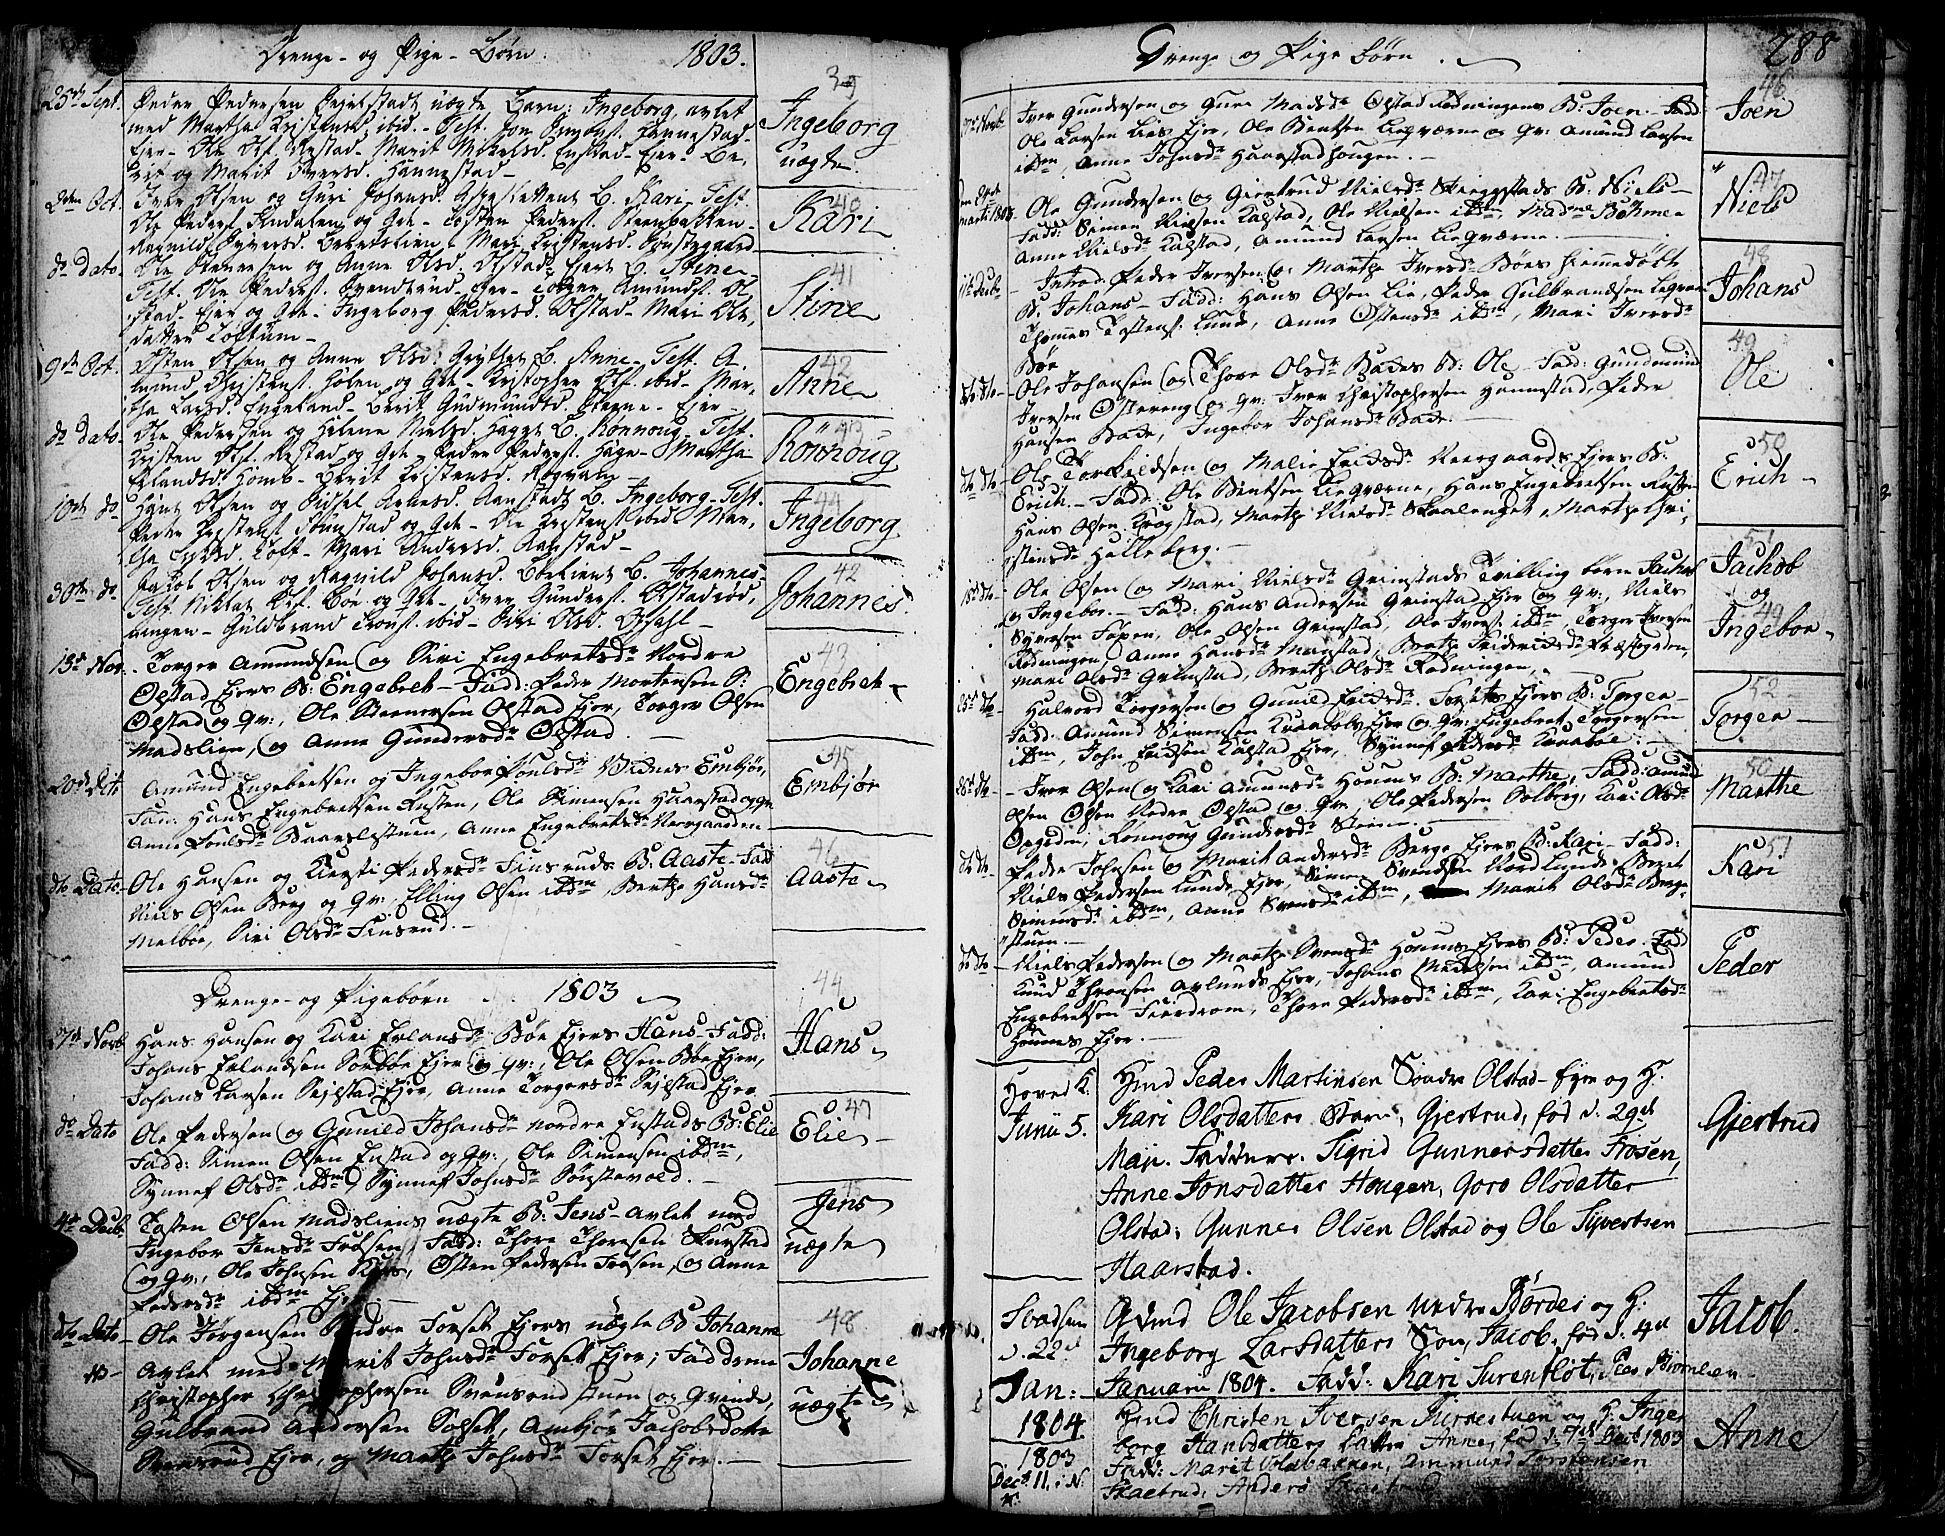 SAH, Gausdal prestekontor, Ministerialbok nr. 3, 1758-1809, s. 288